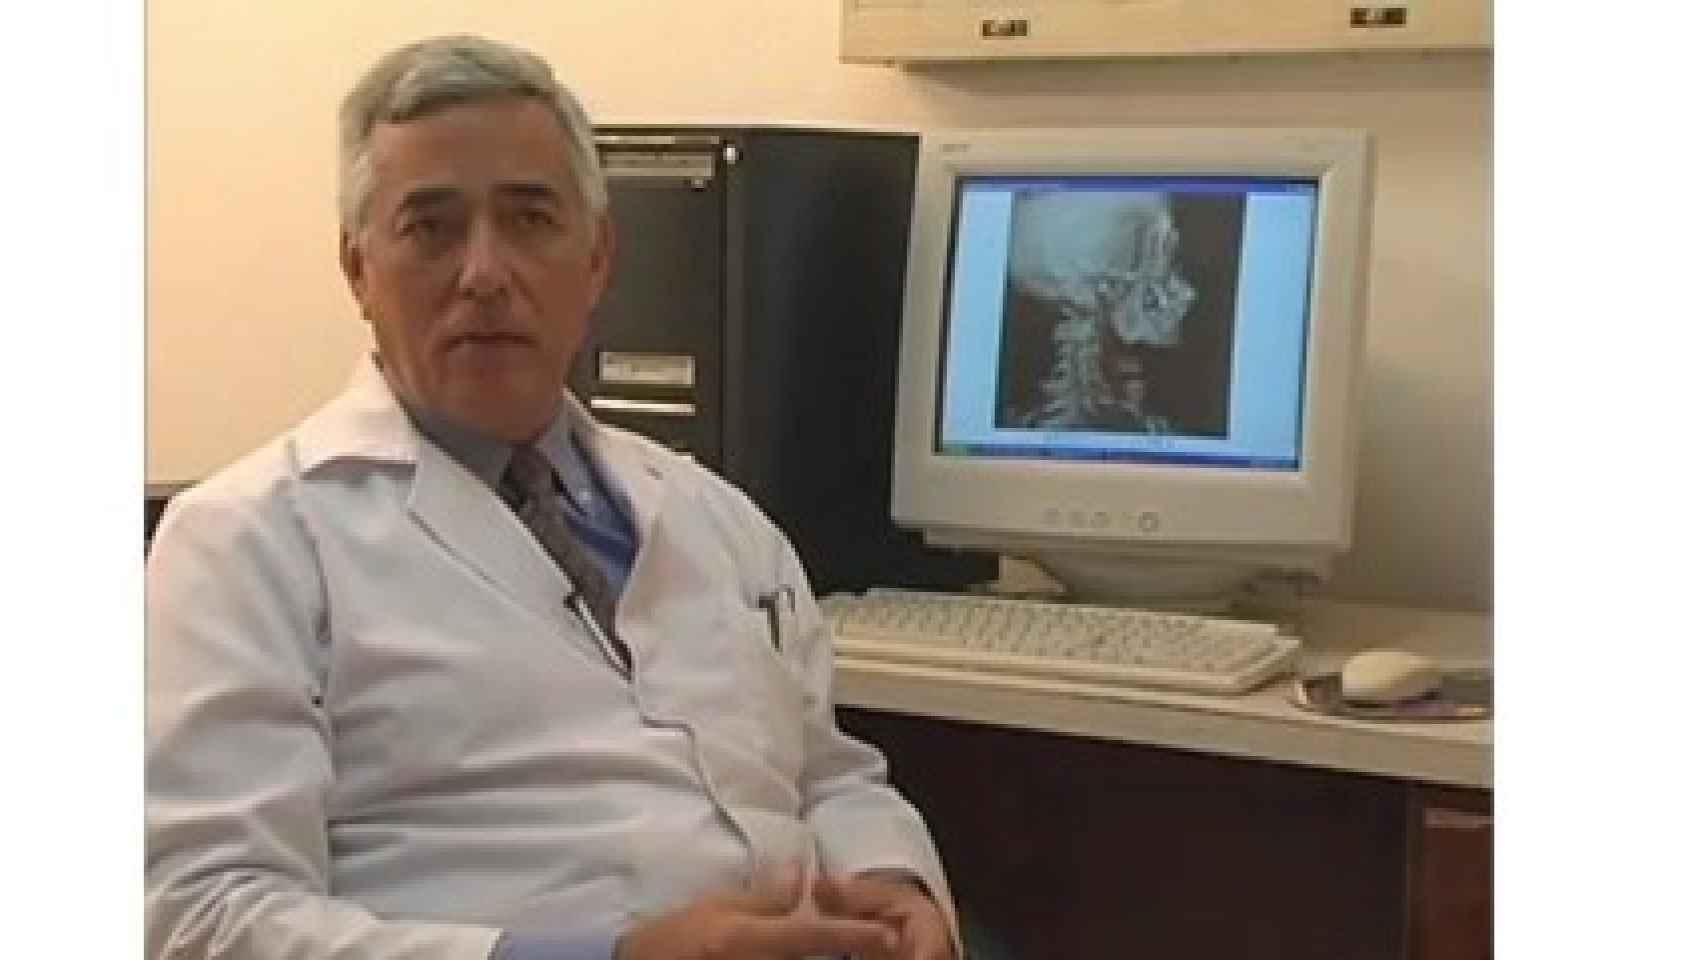 El neúrologo Carlos Suárez Monteagudo